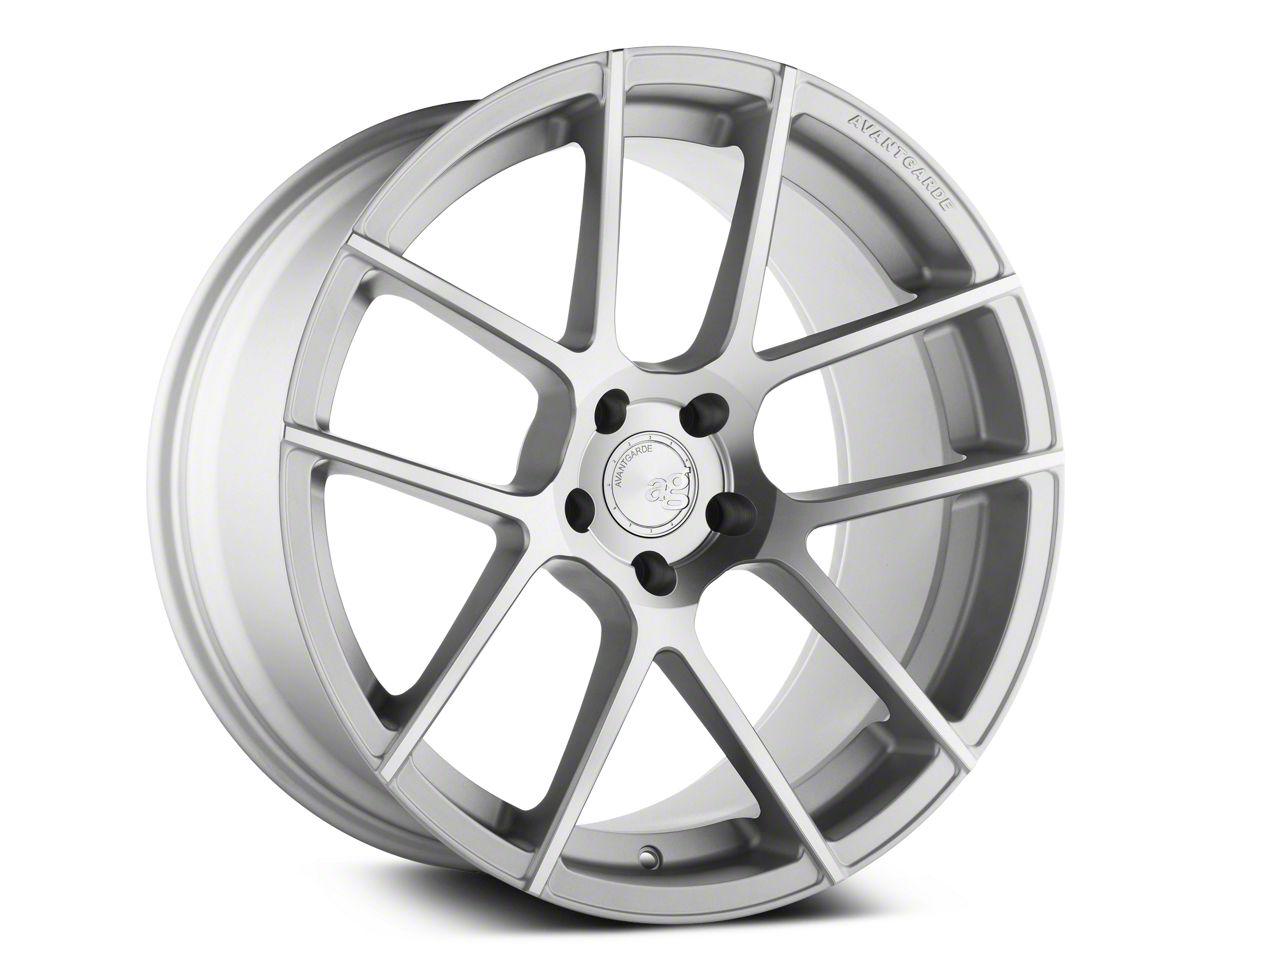 Avant Garde M510 Satin Silver Wheel - 20x10 - Rear Only (05-14 All)